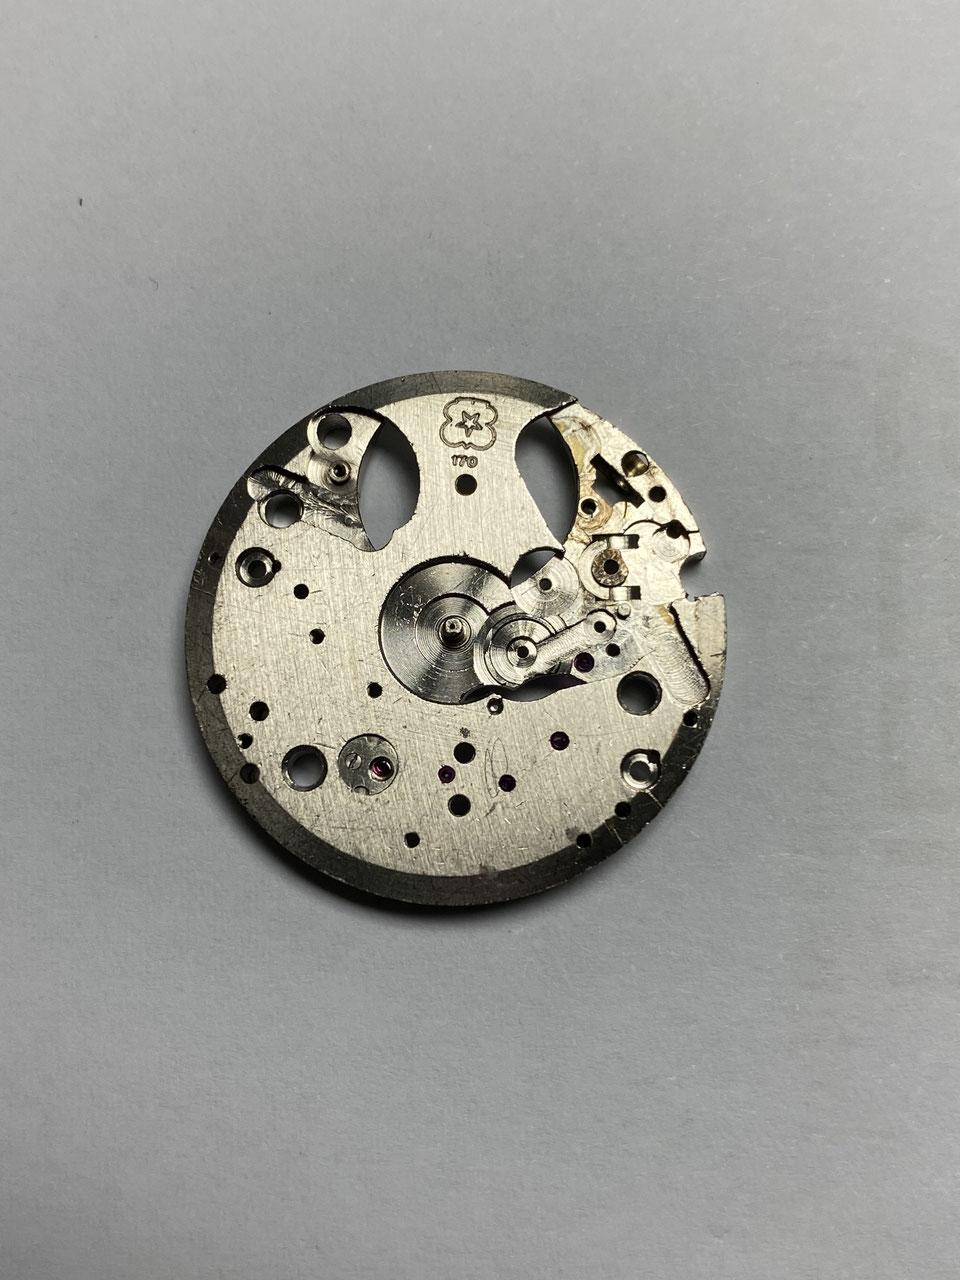 3 Aufzugswellen Landeron 13 1//2 ``` 520,90 Ronda 1555 neuwertig,ältere Lagerware